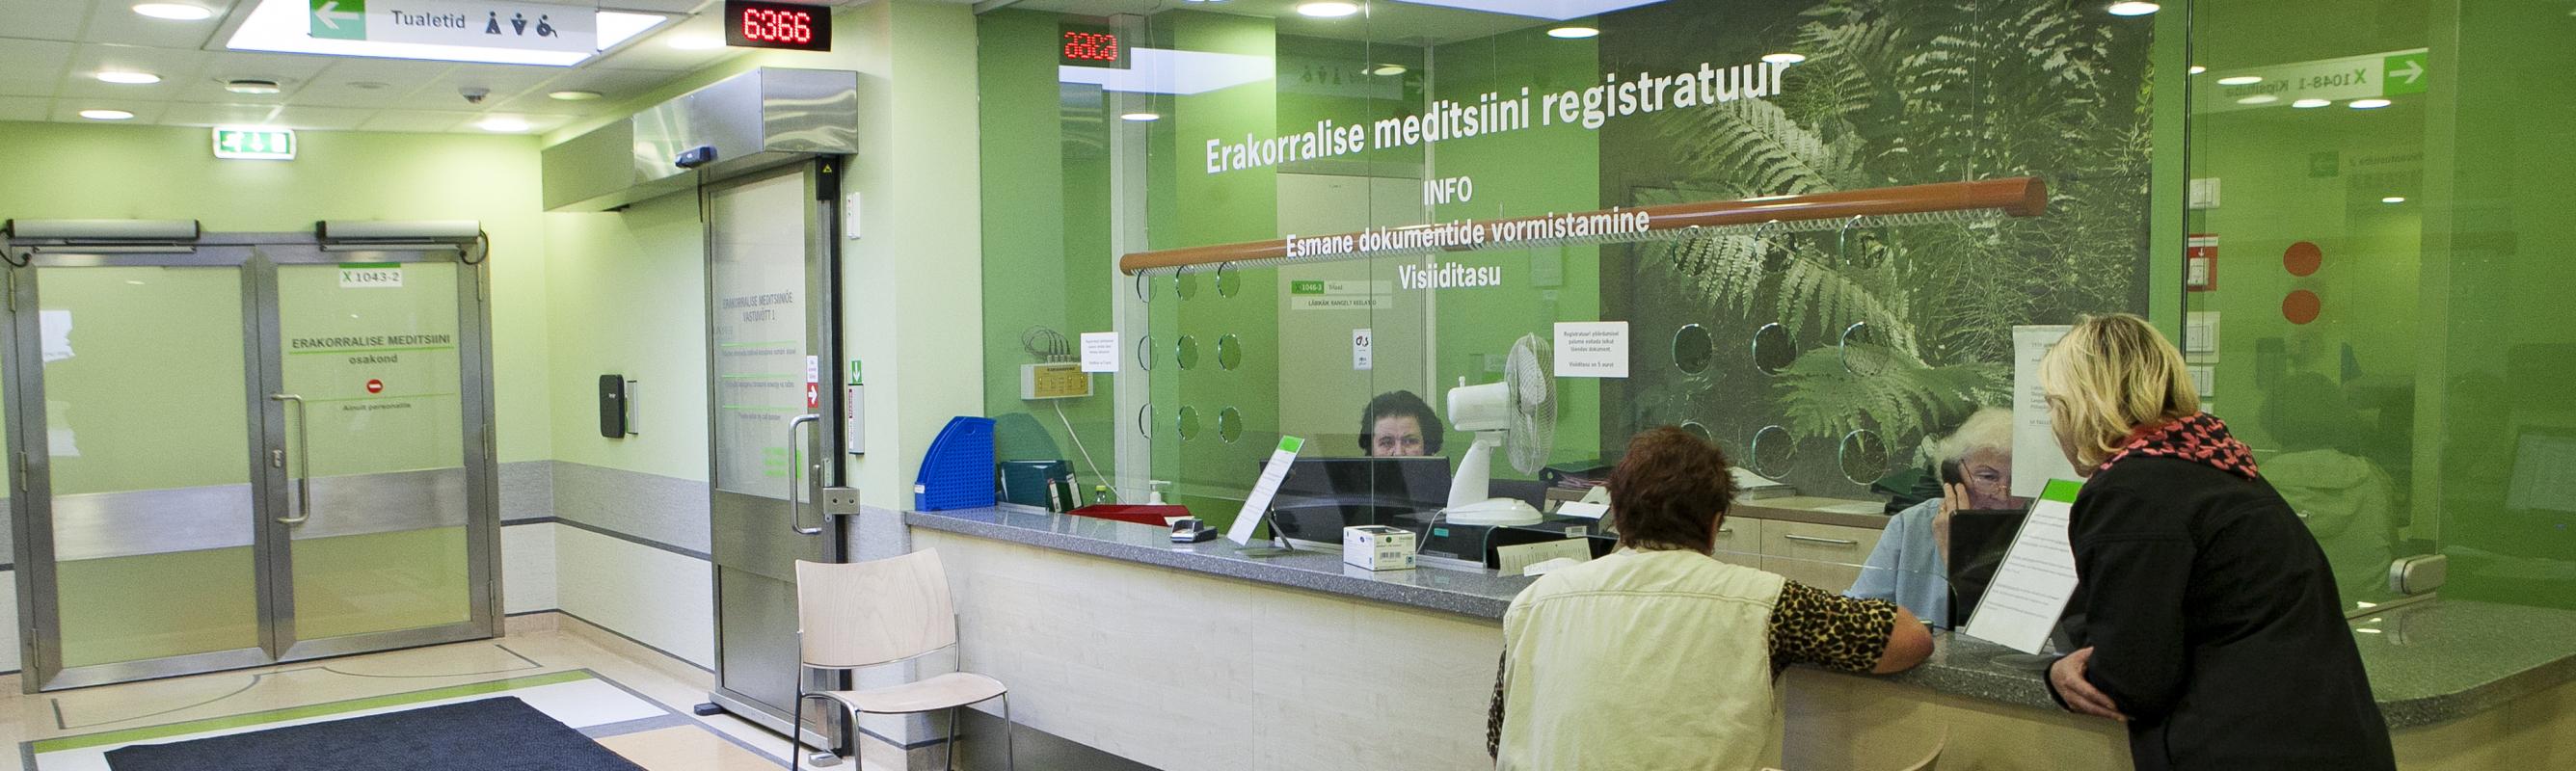 EMO registratuur